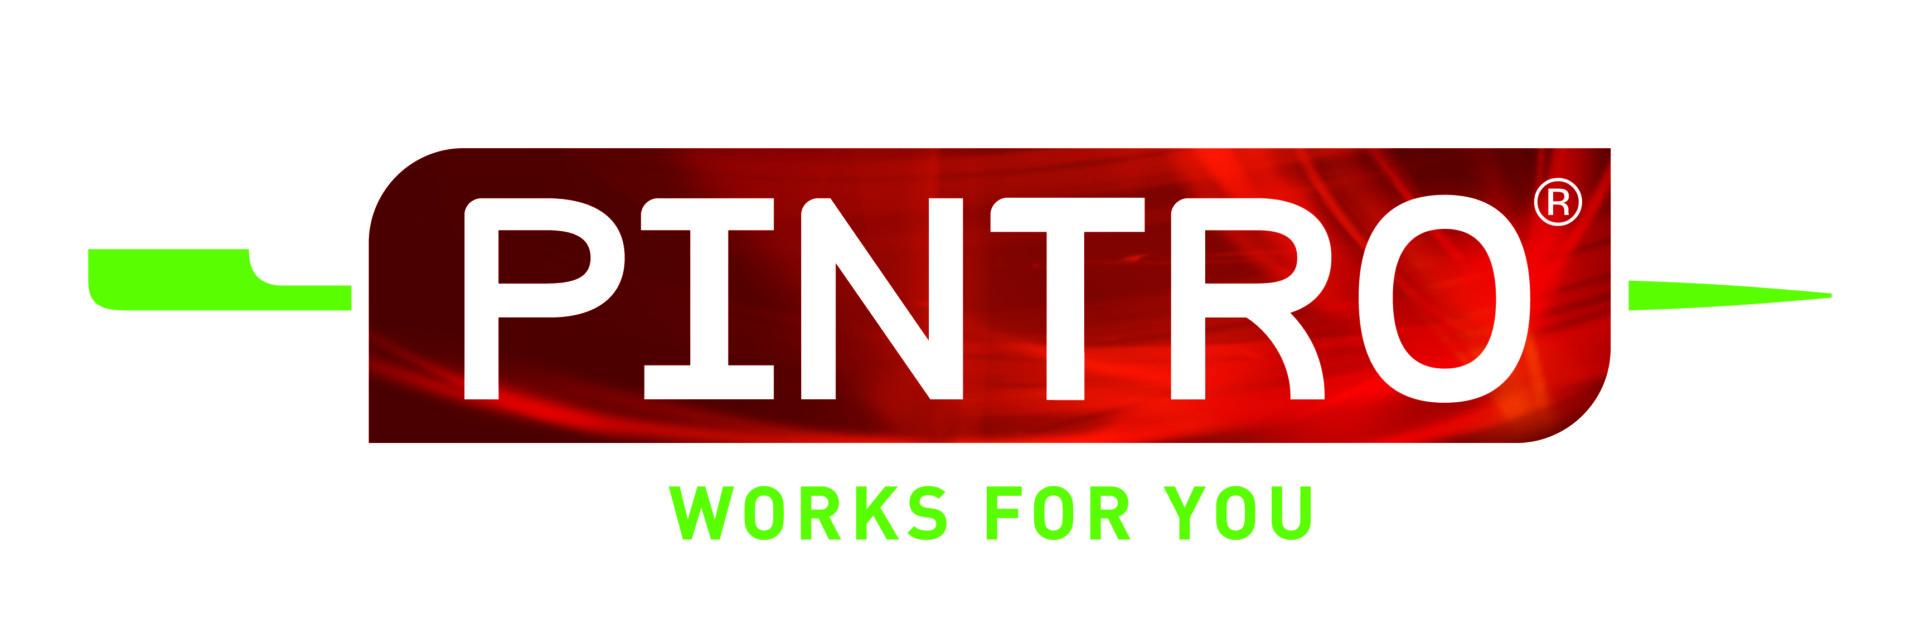 Pintro-logo-wfy-01-7718b2-1